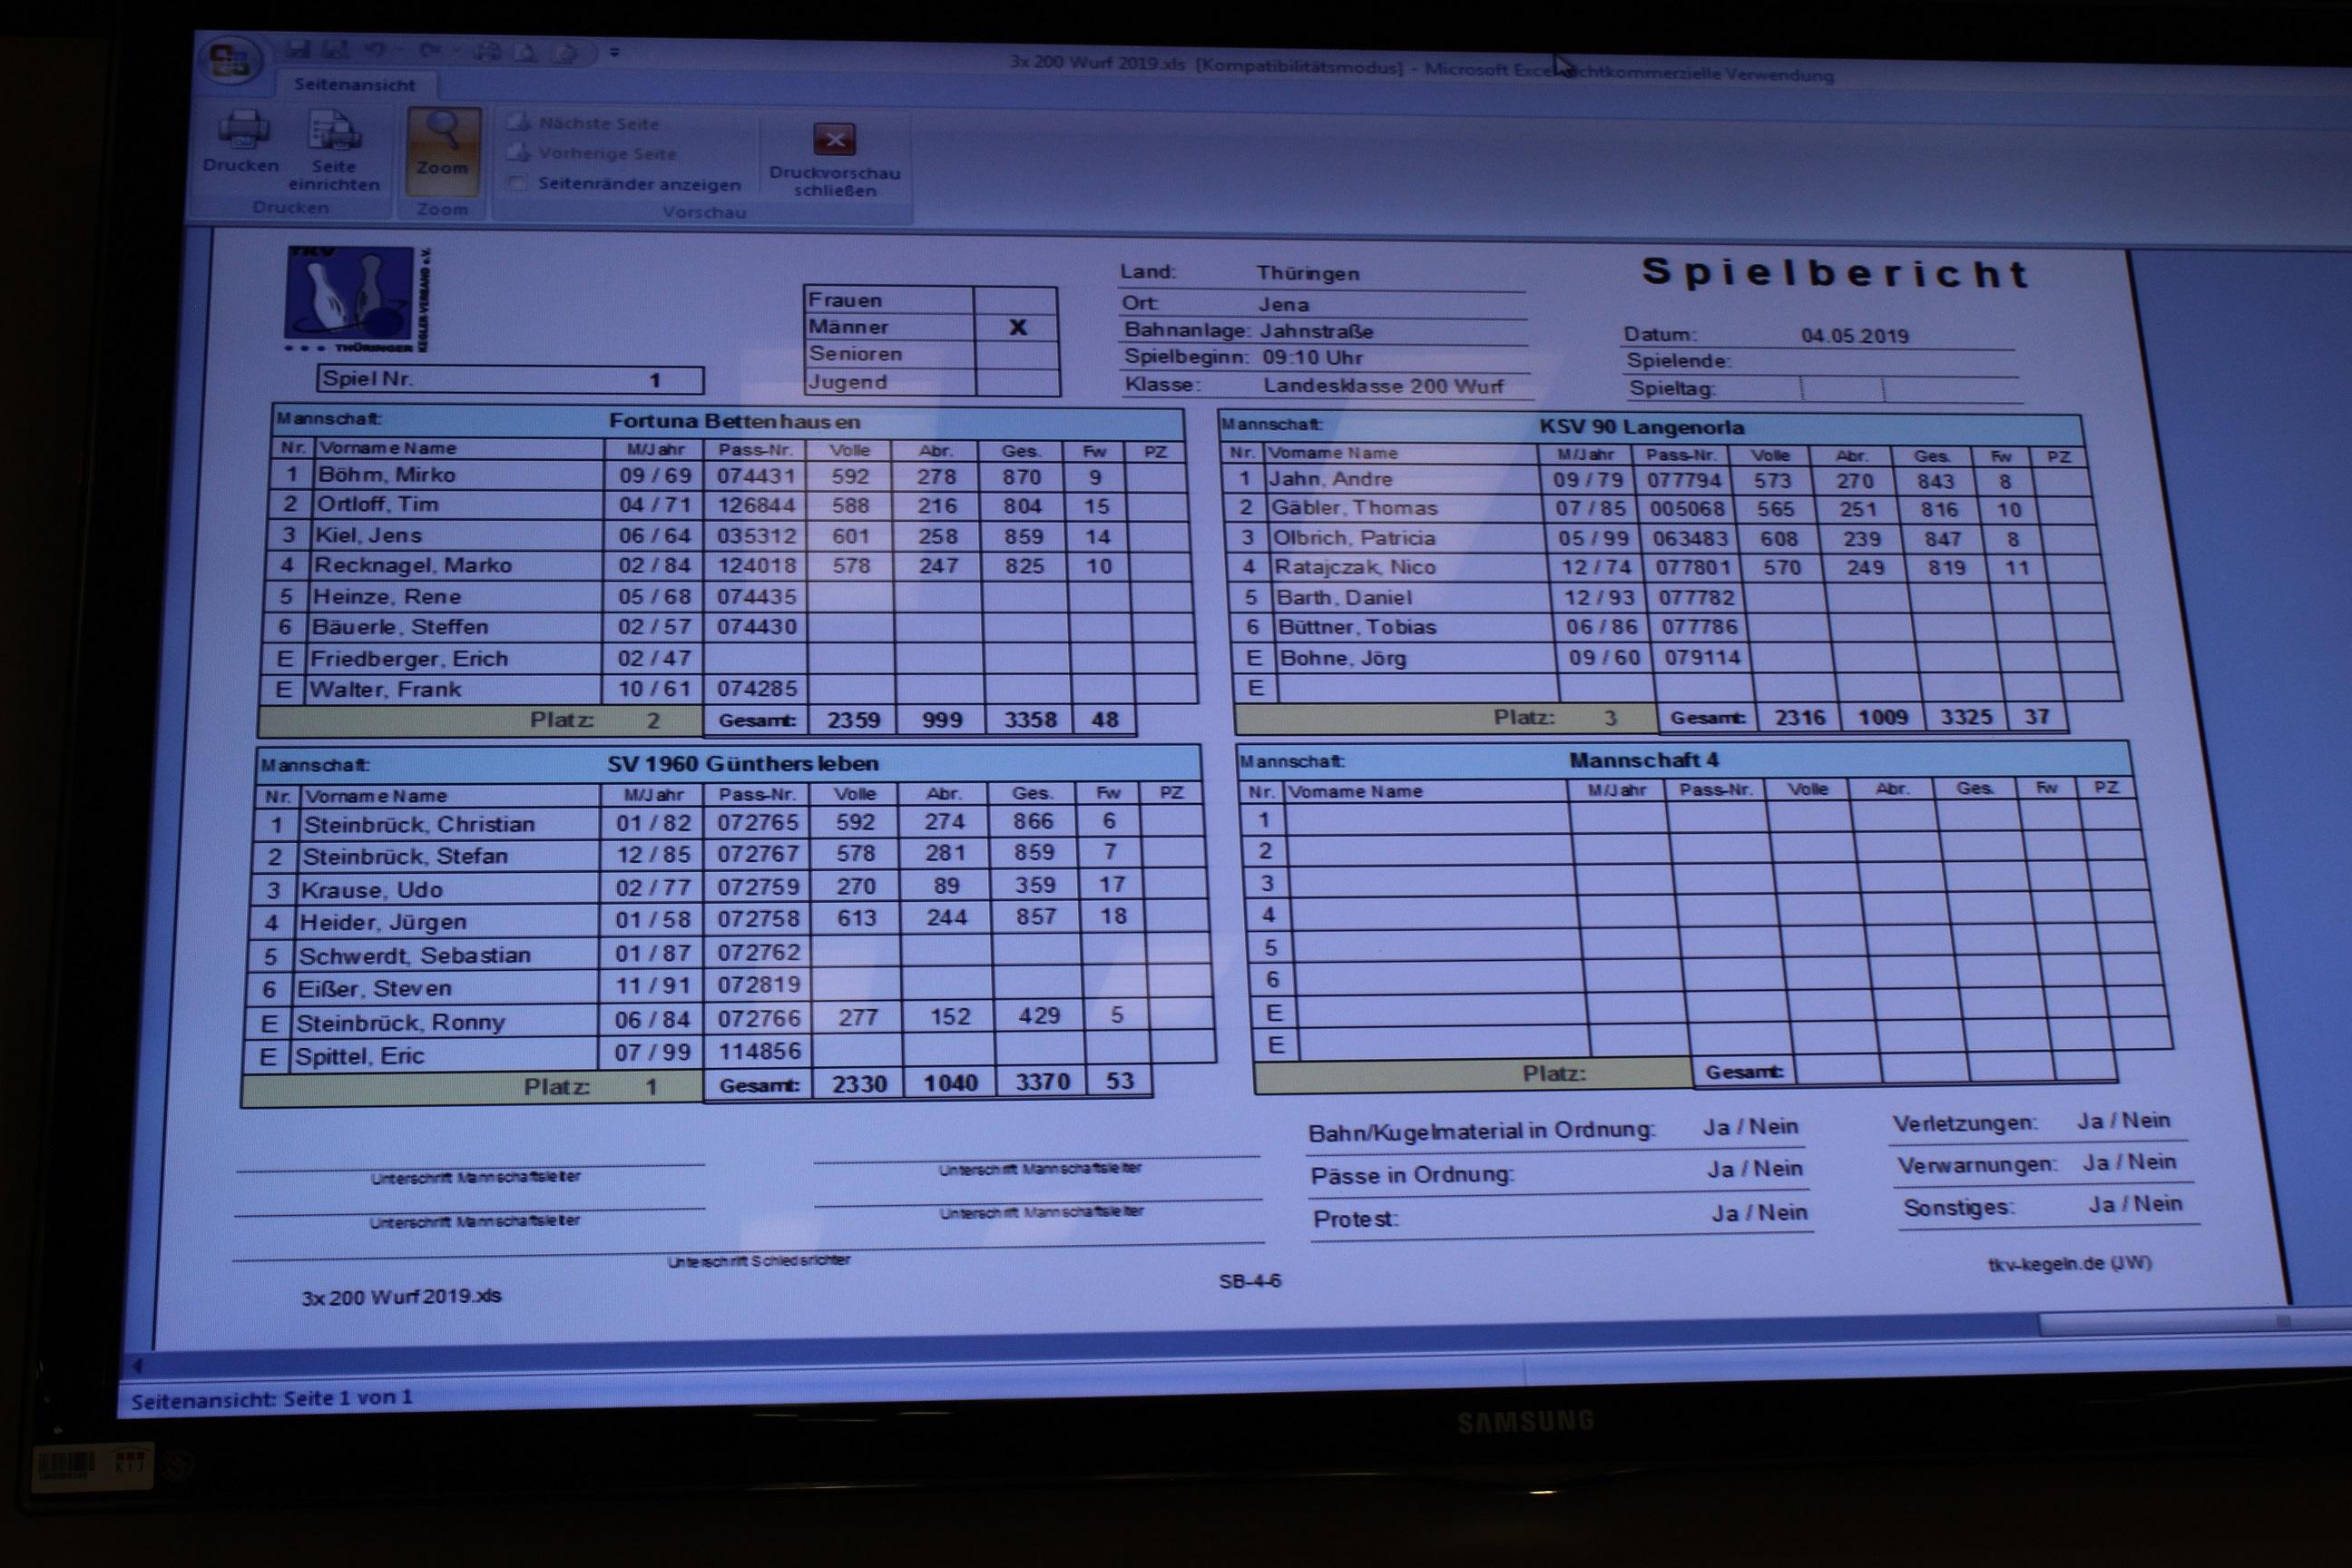 Landesmeisterschaft Protokoll1